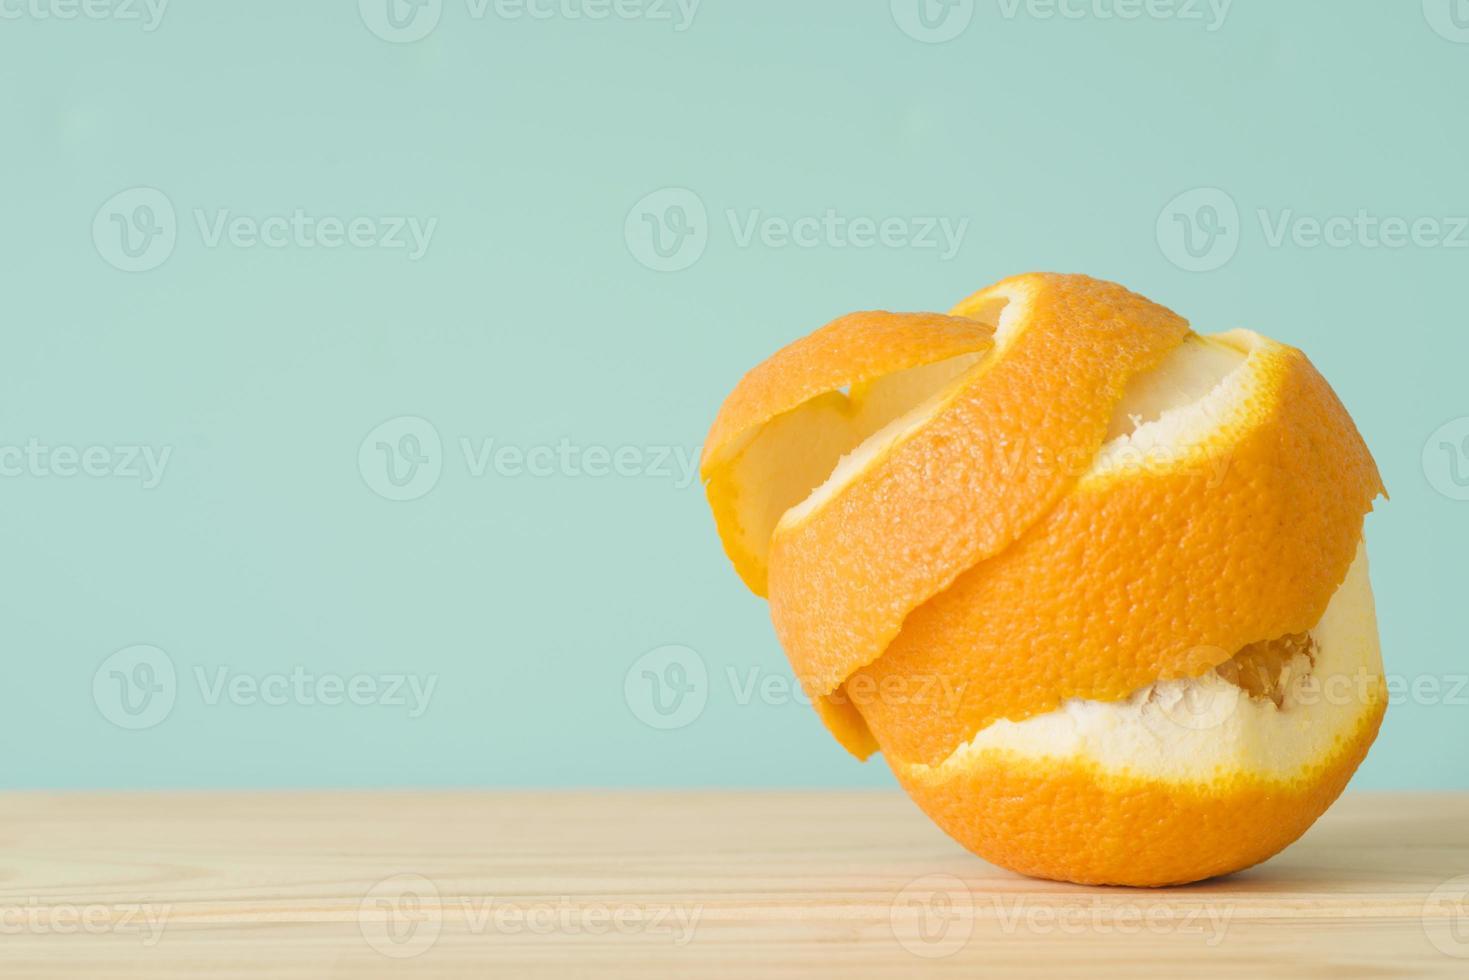 close-up geschild oranje fruit op houten oppervlak foto